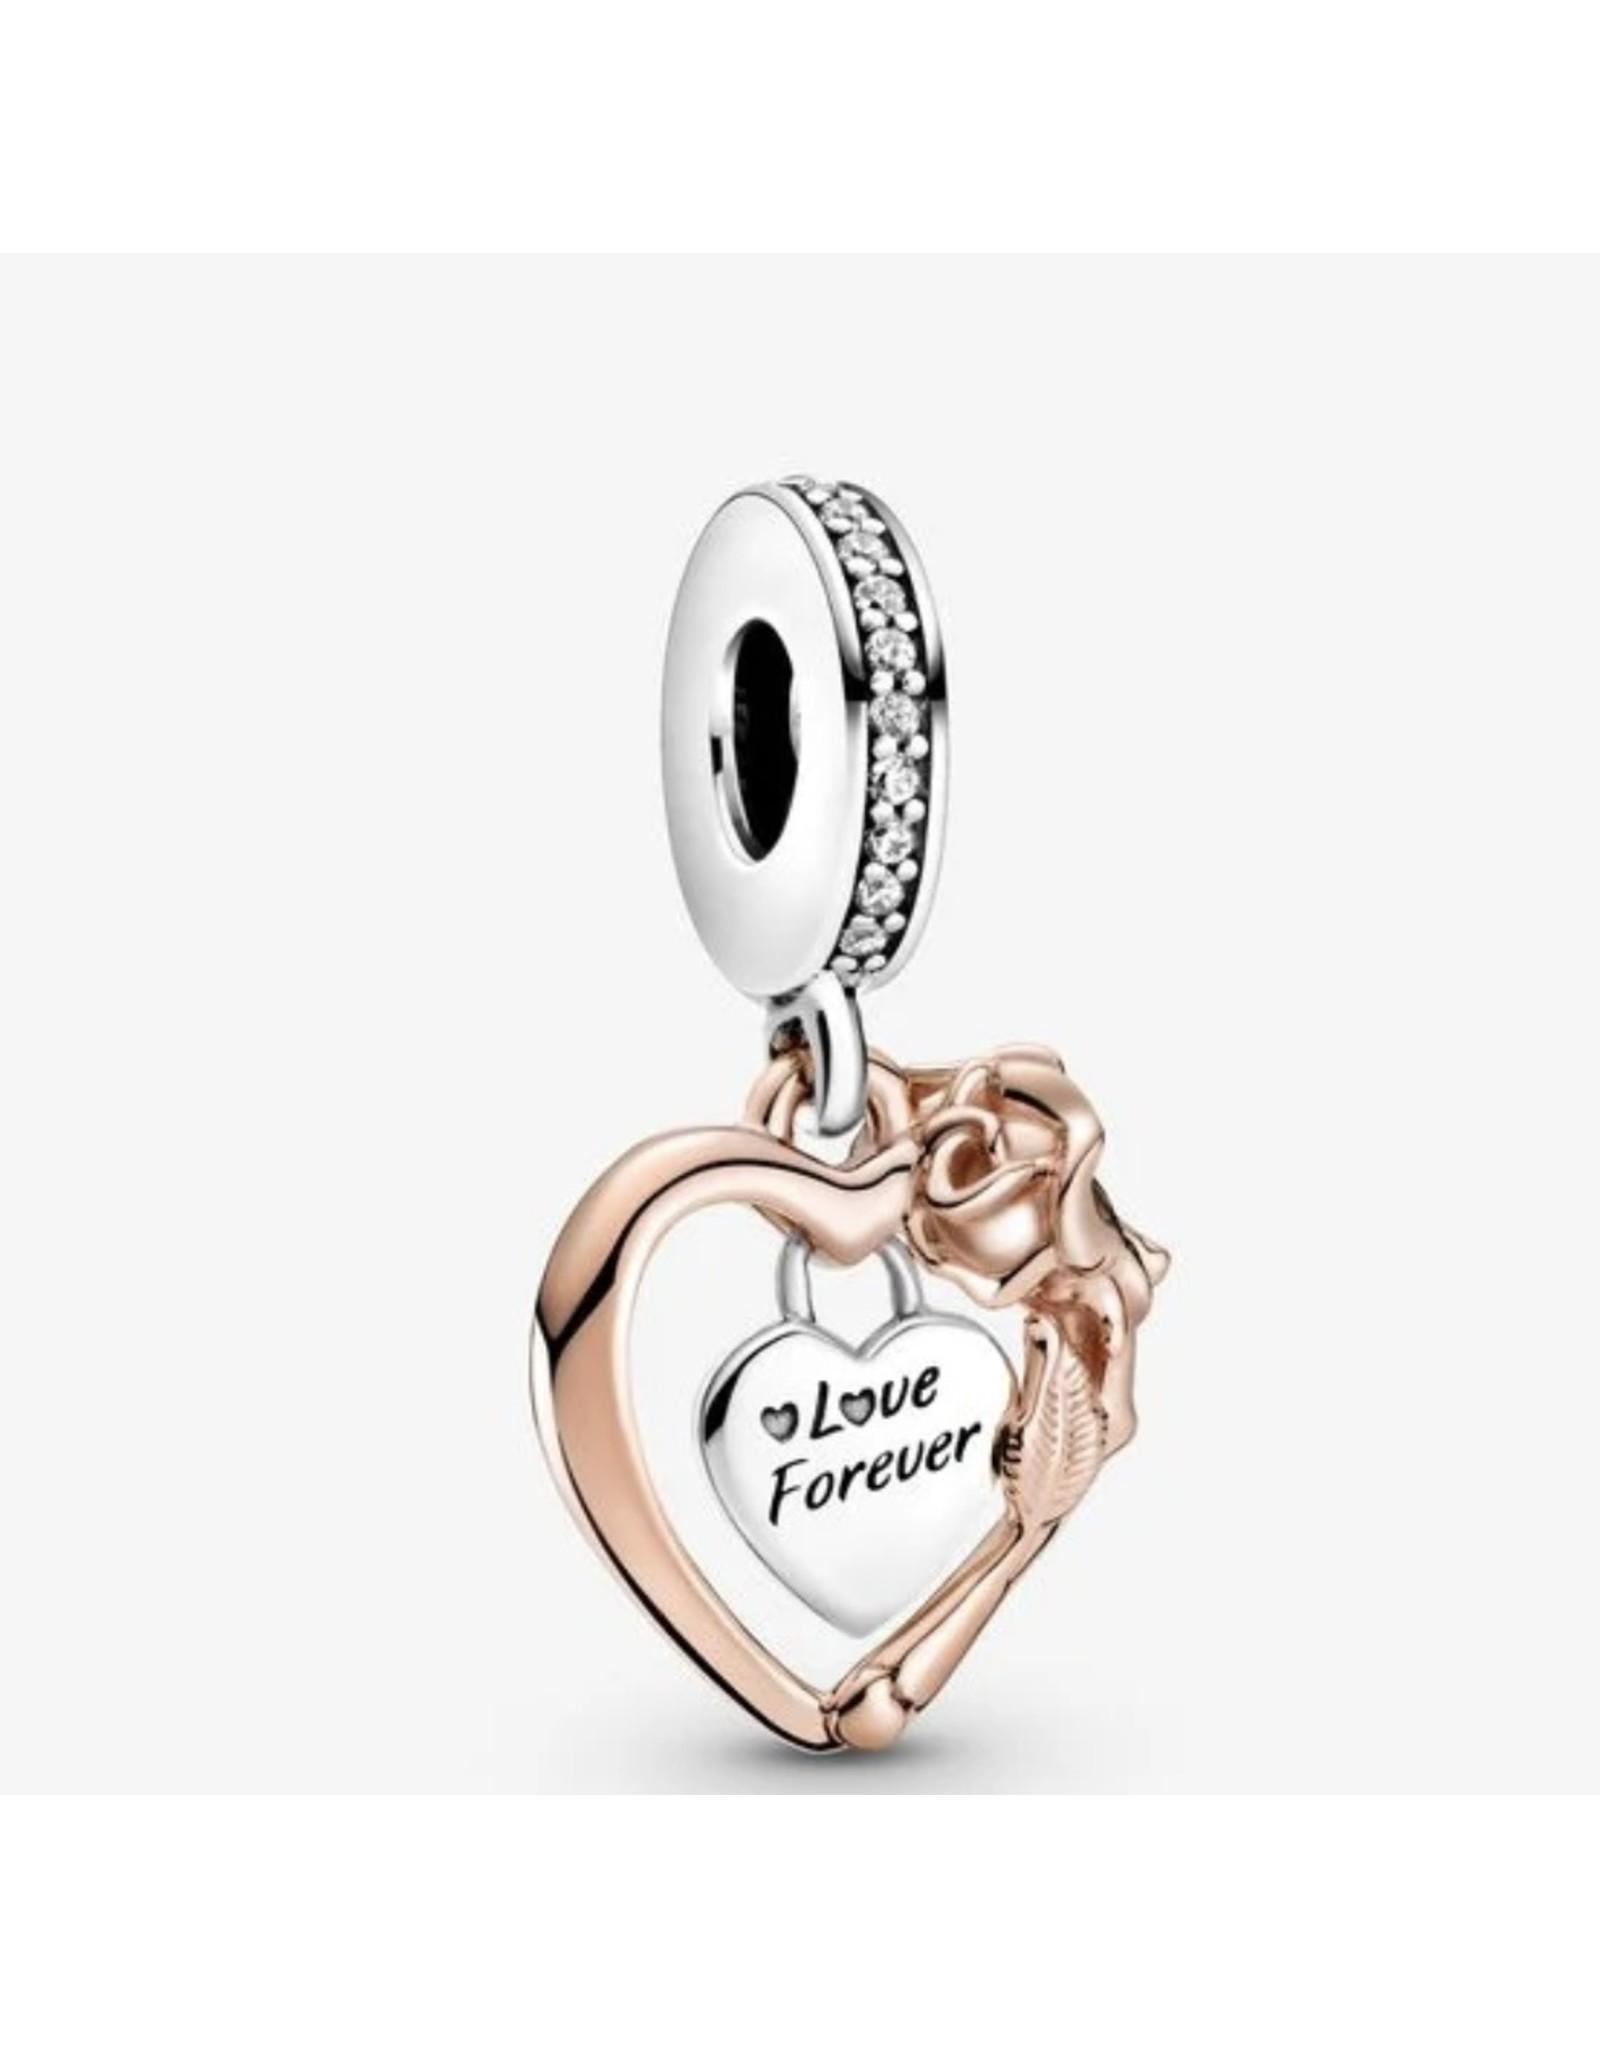 Pandora Pandora Charm,789290C01, Heart & Rose Flower, Clear CZ With Rose Gold